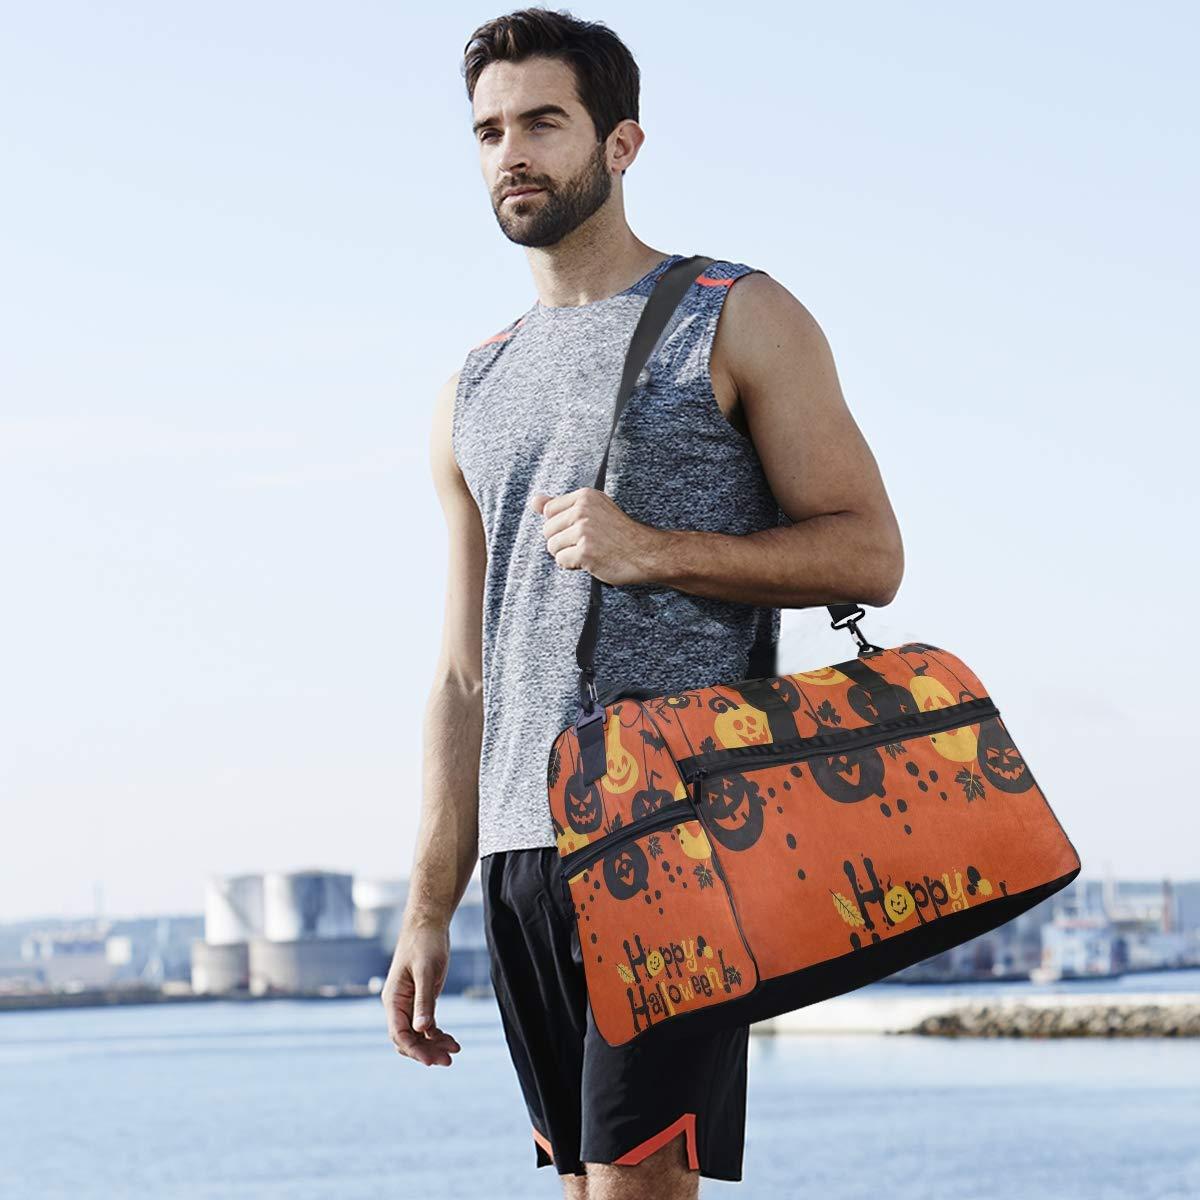 Cartoon Pumpkin Bat Happy Halloween Large Canvas shoulder bag with Shoe Compartment Travel Tote Luggage Weekender Duffle Bag